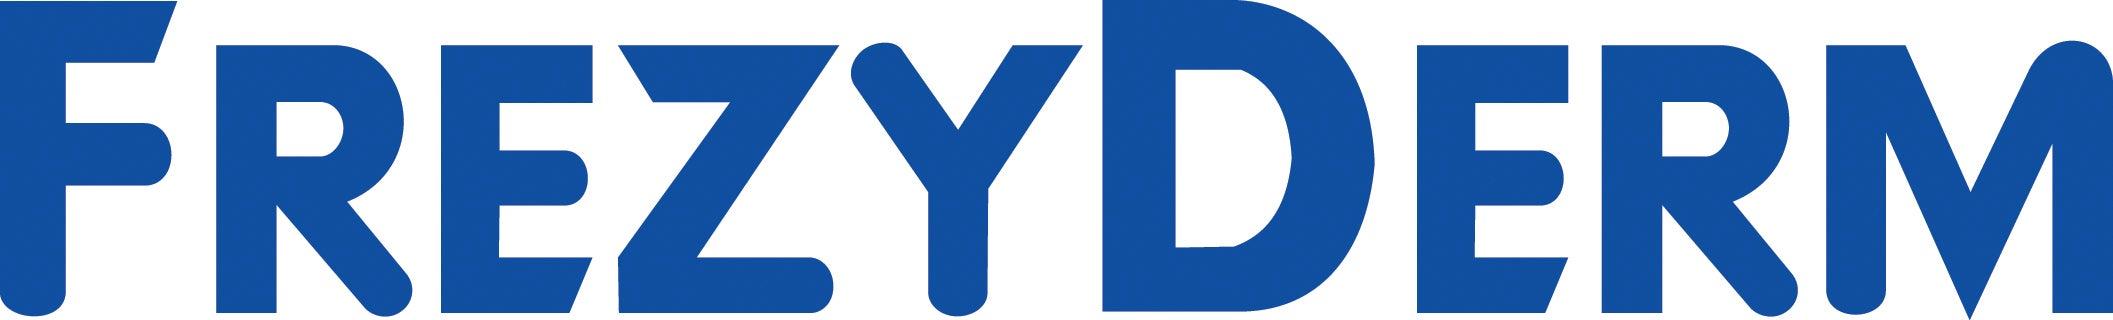 Frezyderm logo white